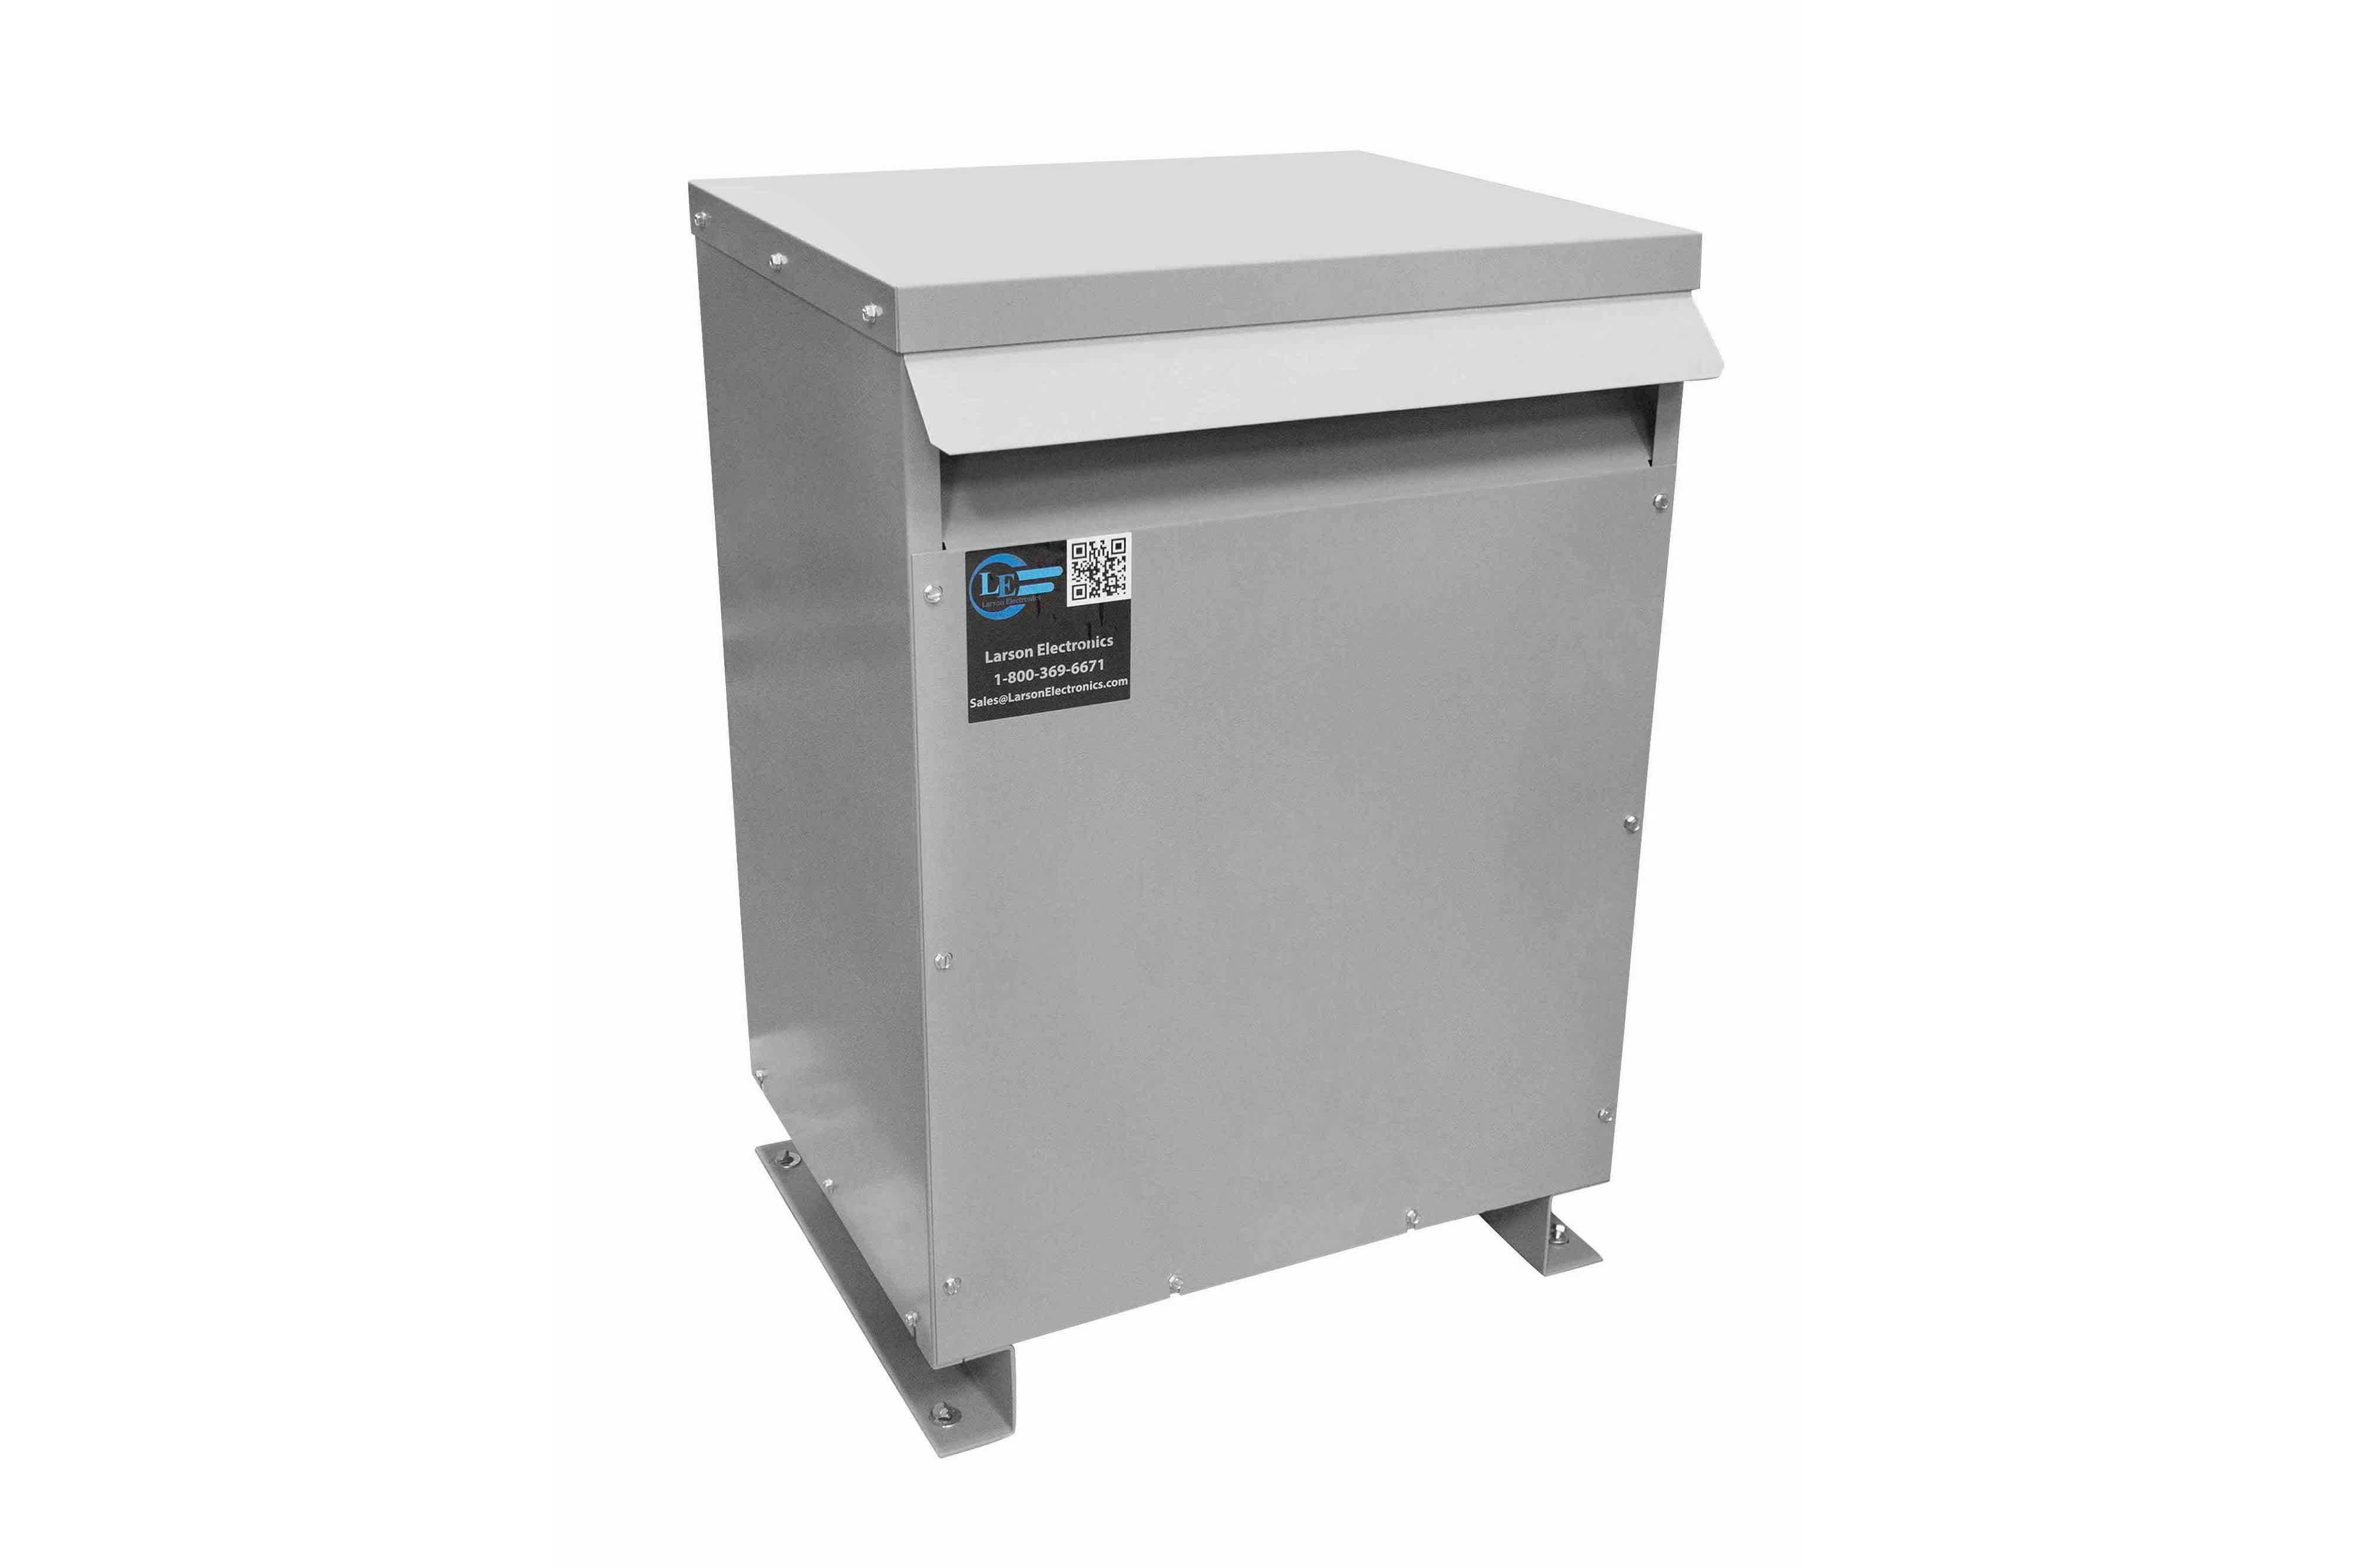 13 kVA 3PH Isolation Transformer, 460V Wye Primary, 600V Delta Secondary, N3R, Ventilated, 60 Hz